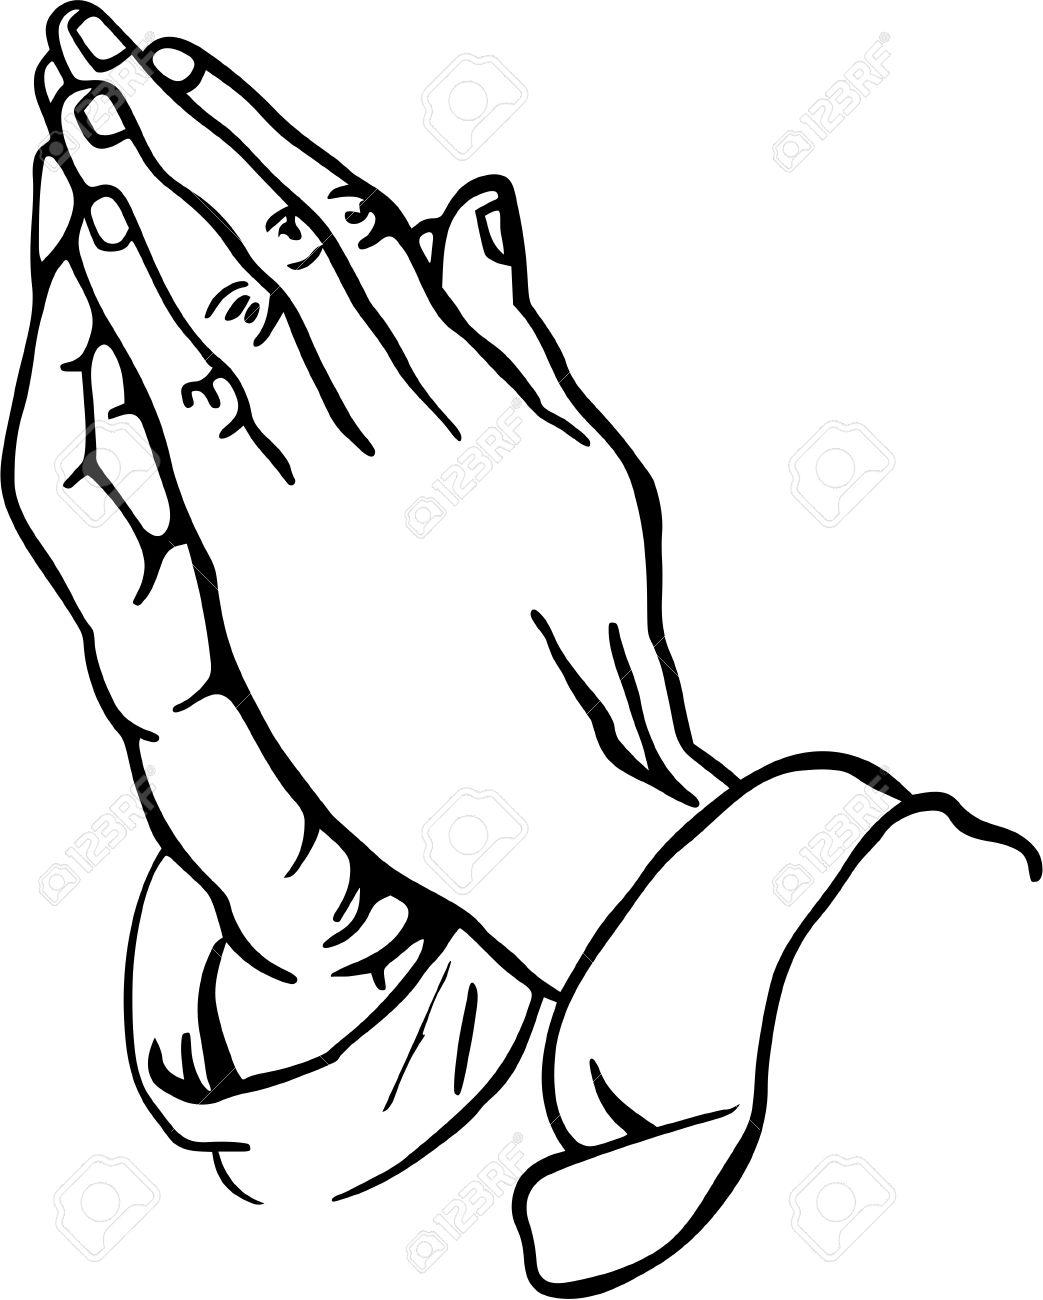 1043x1300 Woman Clipart Praying Hand